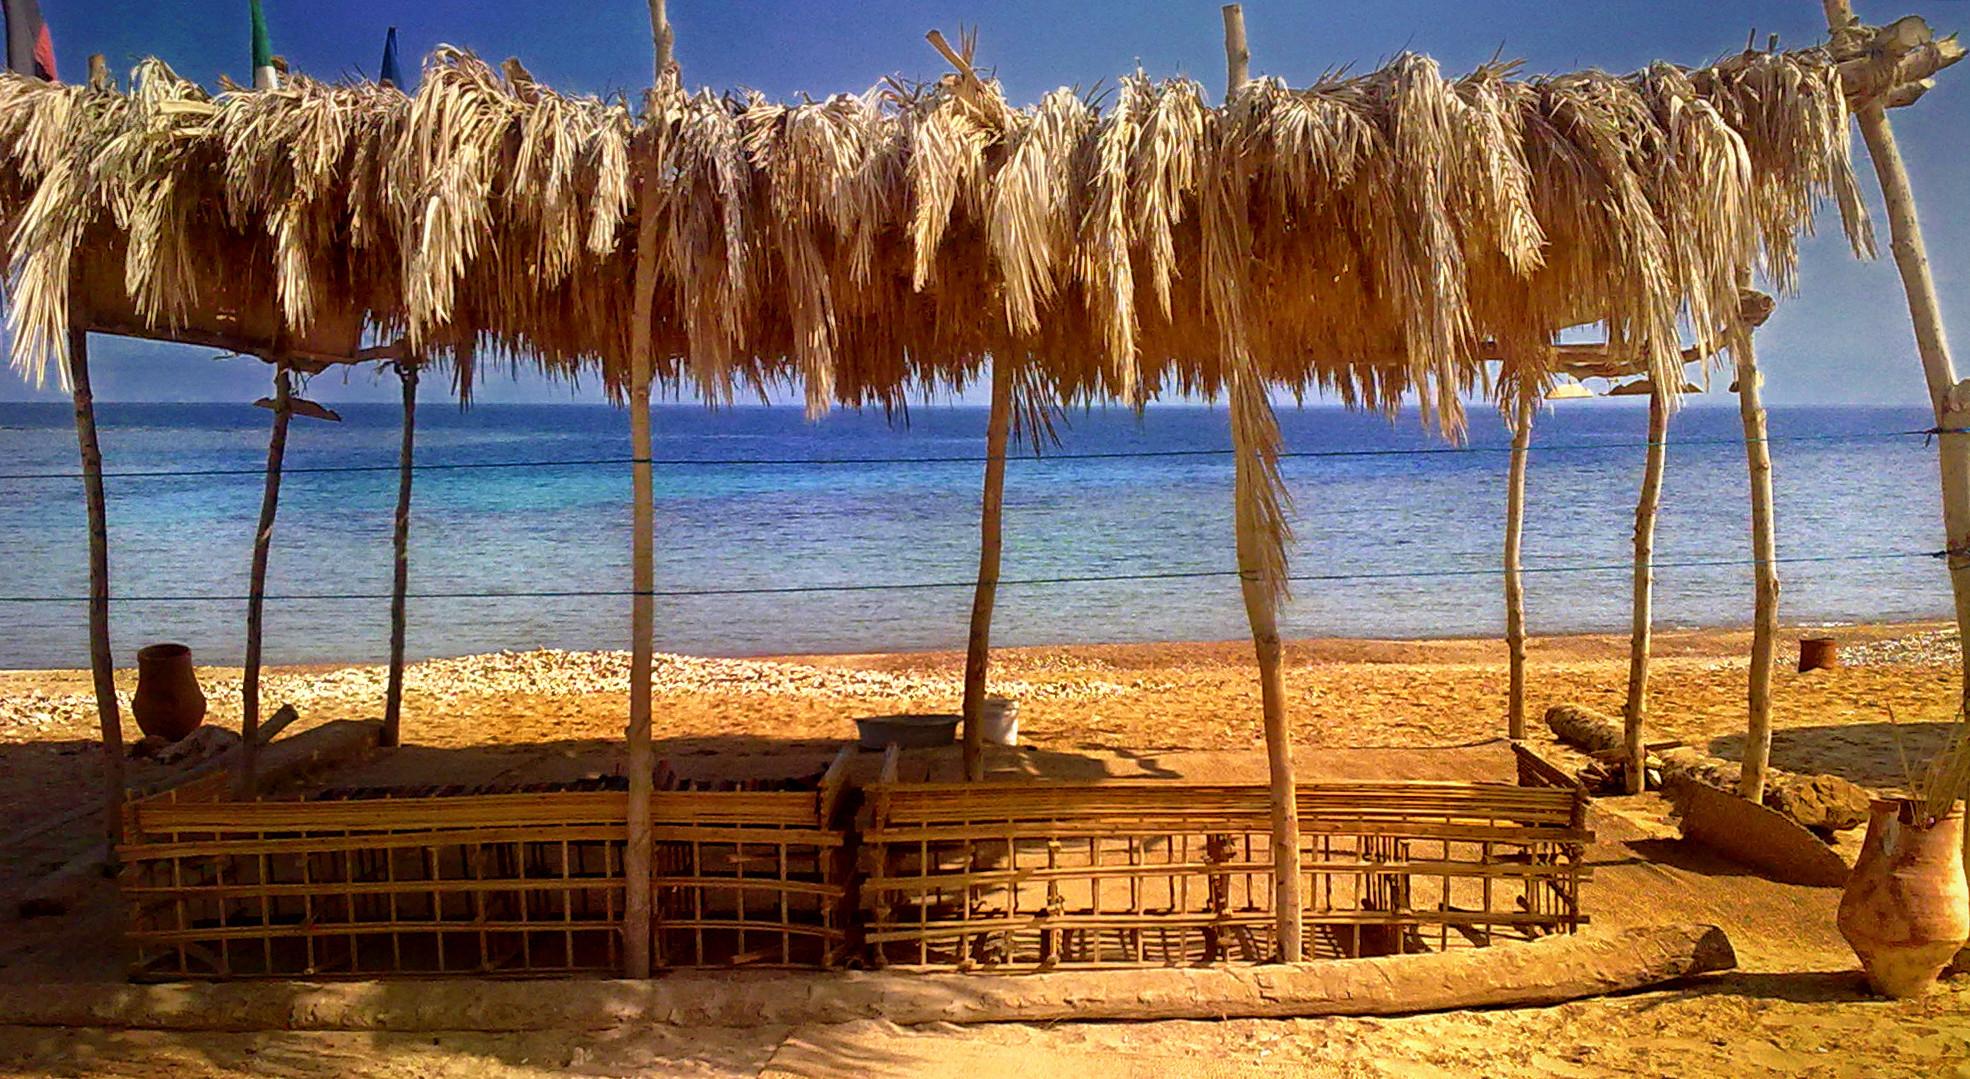 snorkeling beach - egypt